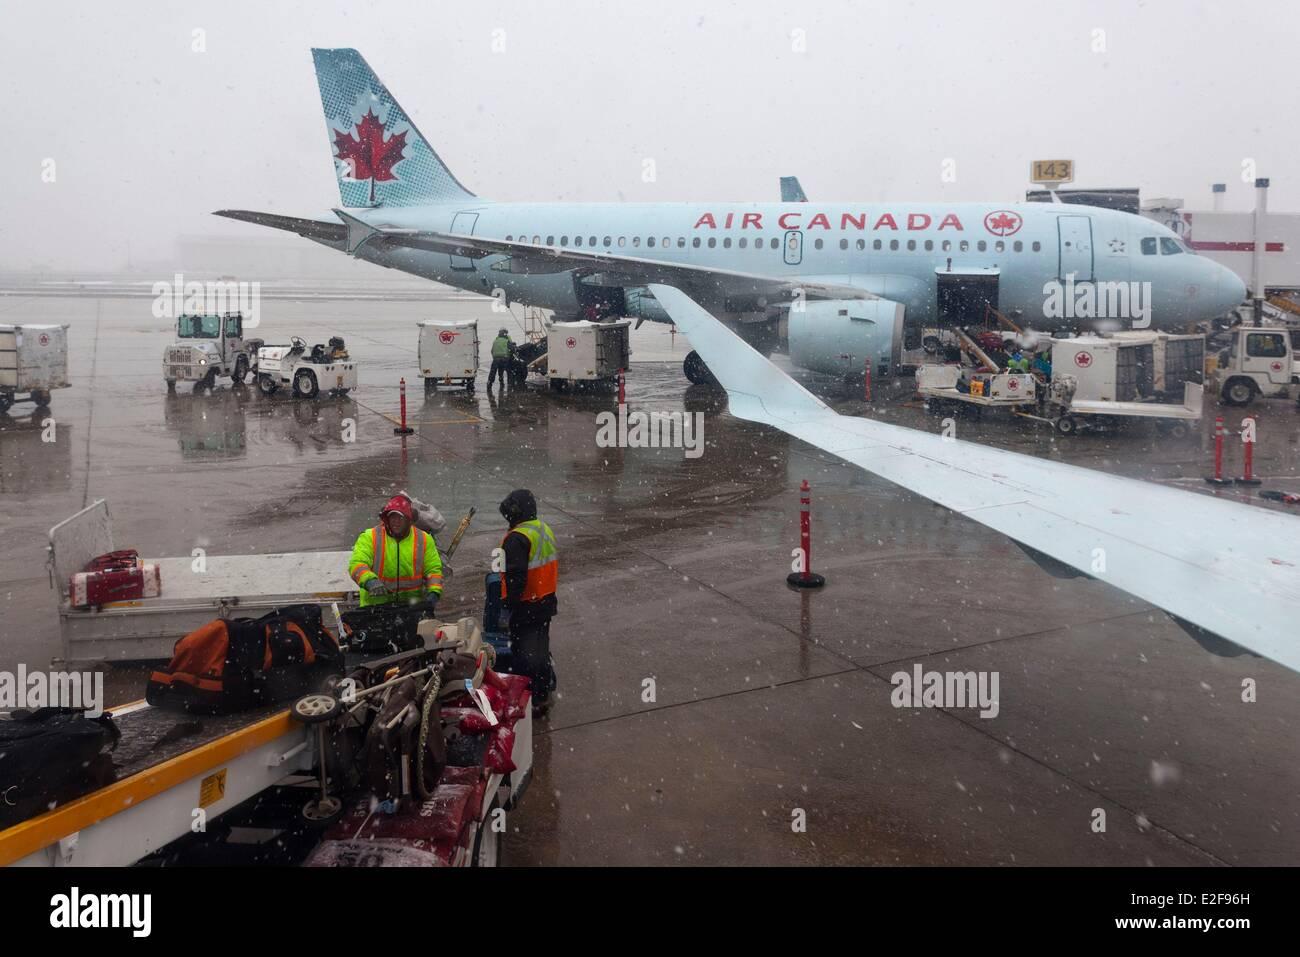 Canada, Saskatchewan, Saskatoon, airport, baggage loading of an Air Canada plane - Stock Image